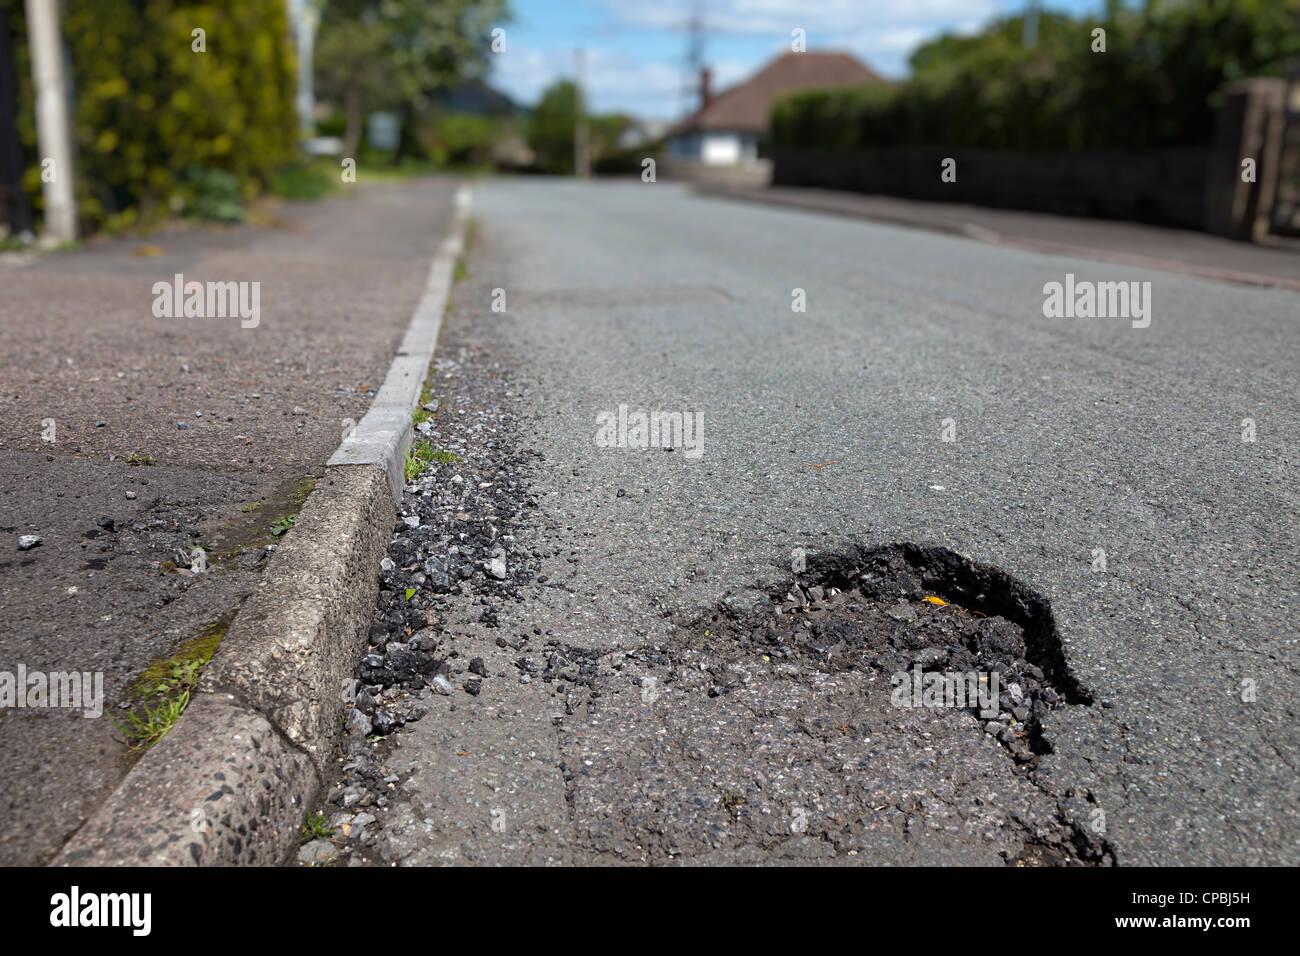 Pothole in road requiring repair, Llanfoist village, Wales, UK - Stock Image